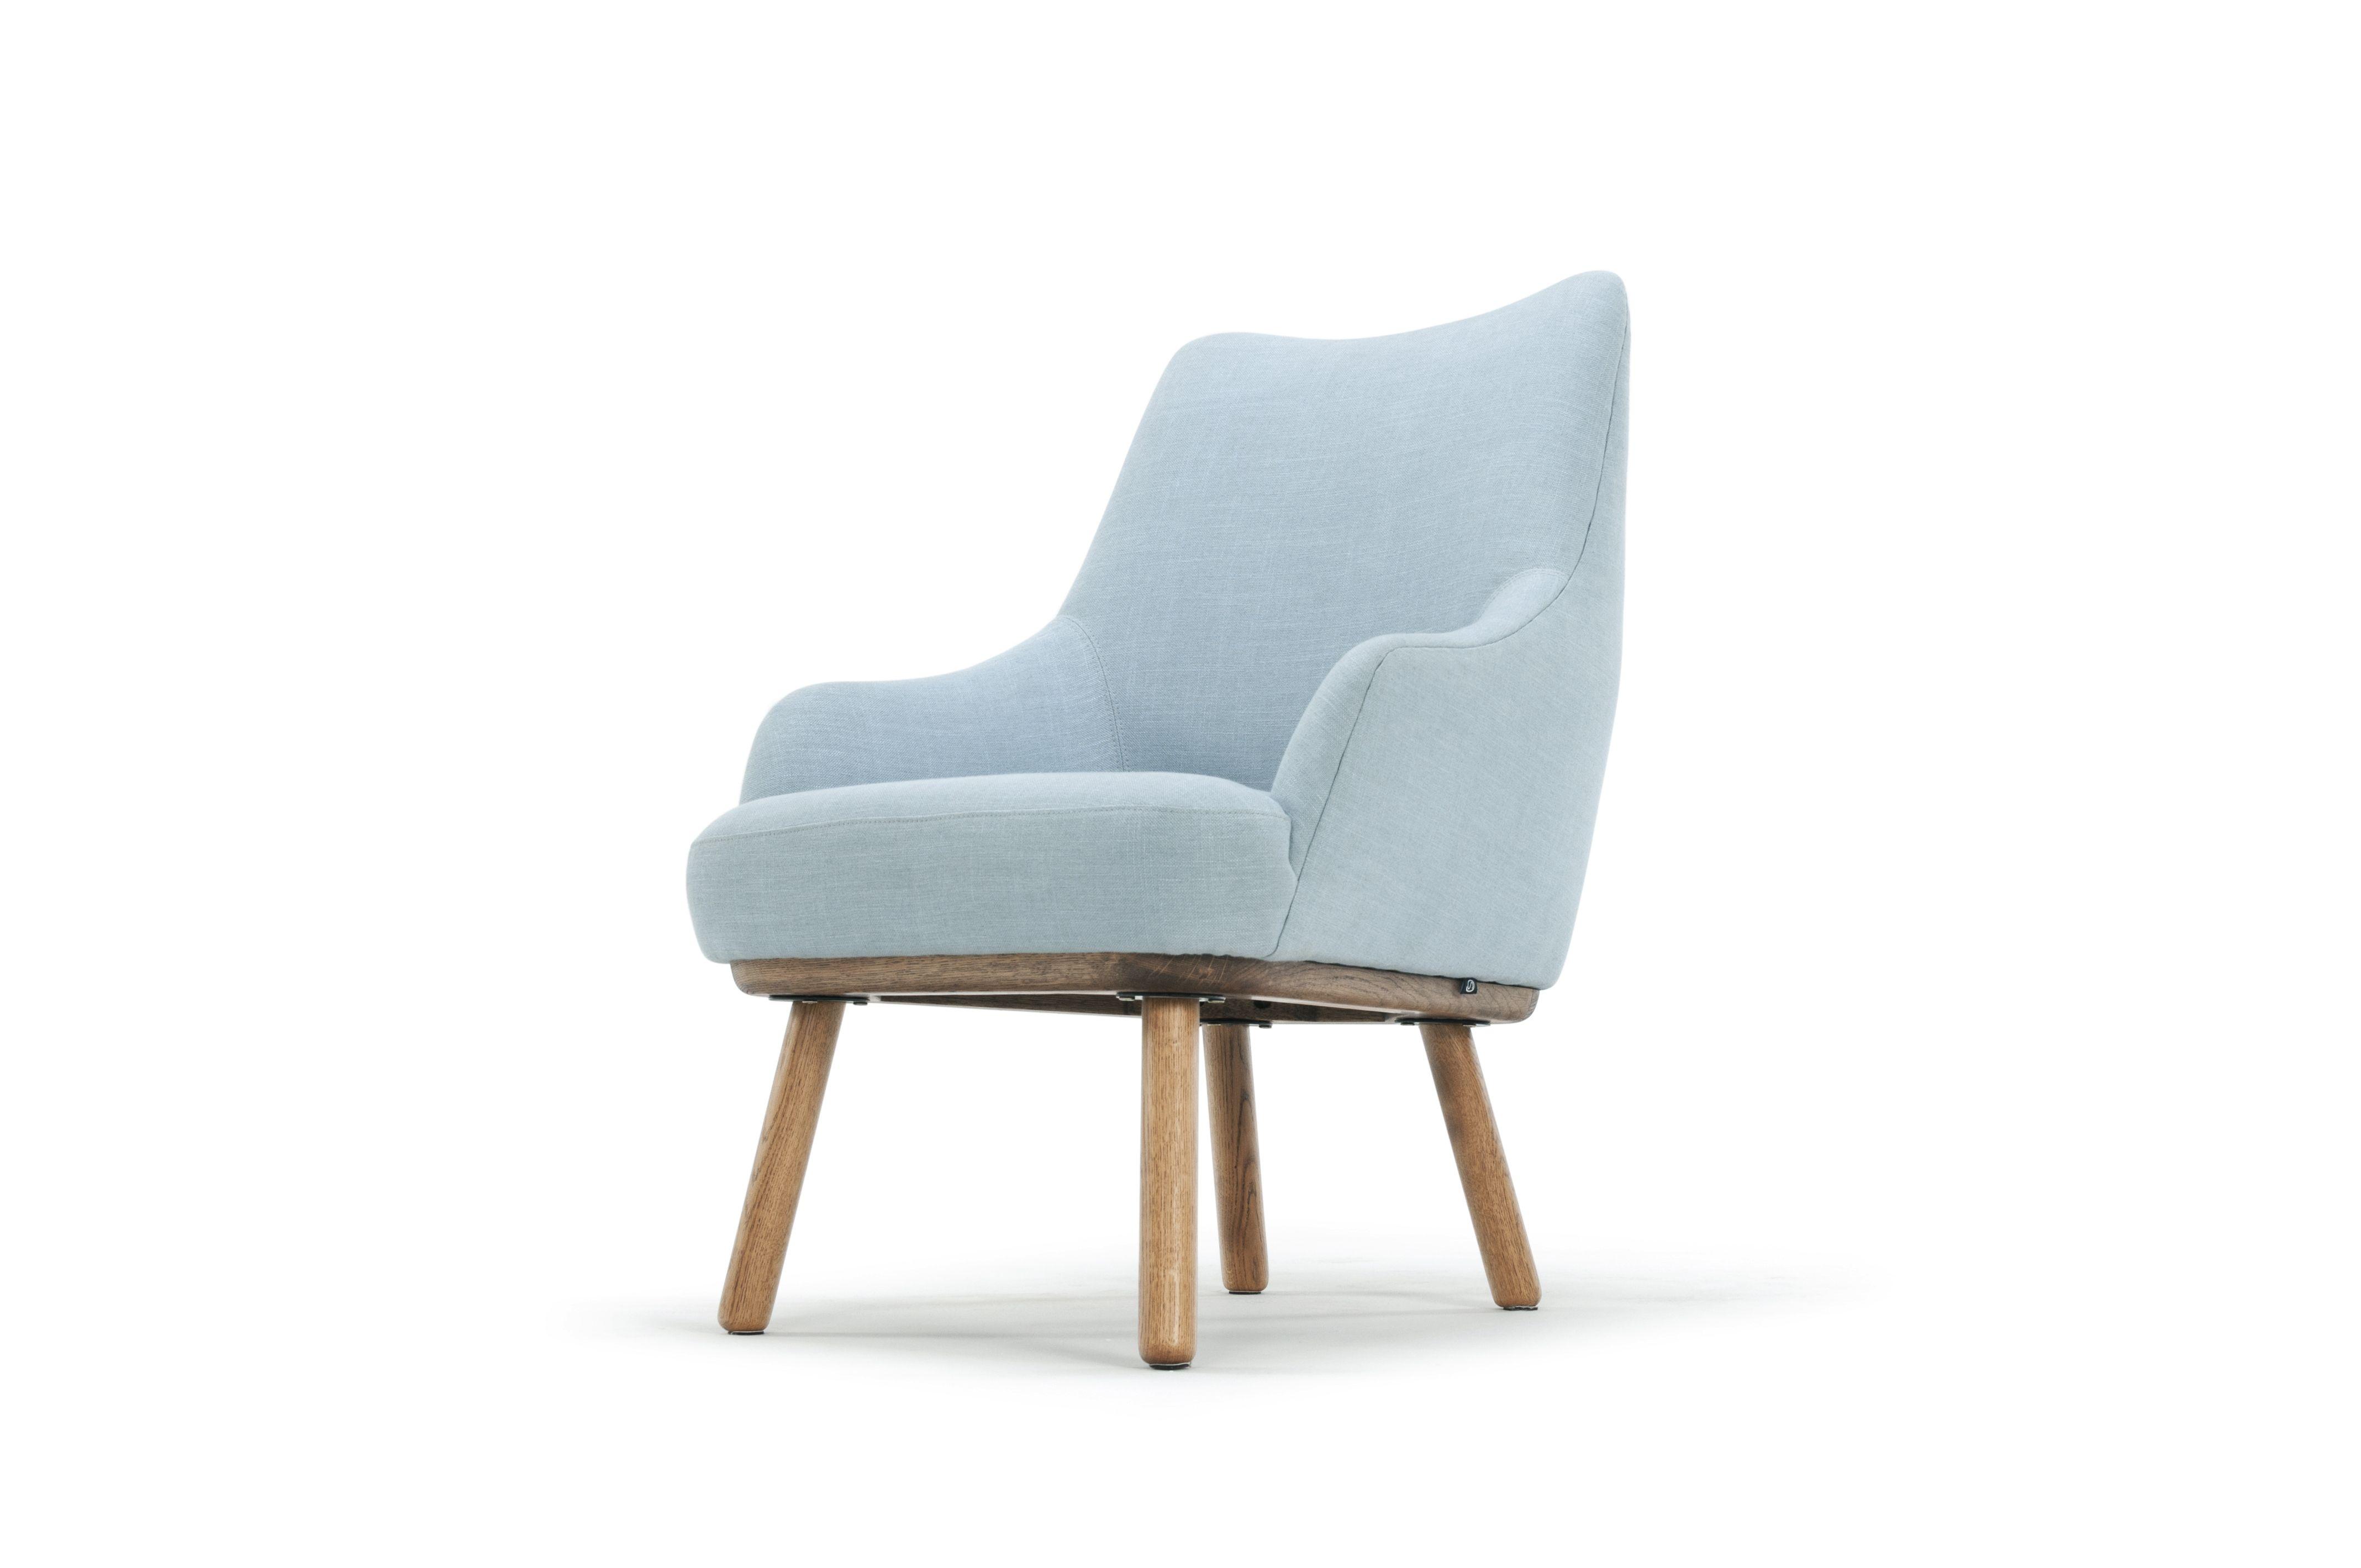 Ebba-https://nl.sofacompany.com/meubels/woonkamer/stoelen/ebba ...